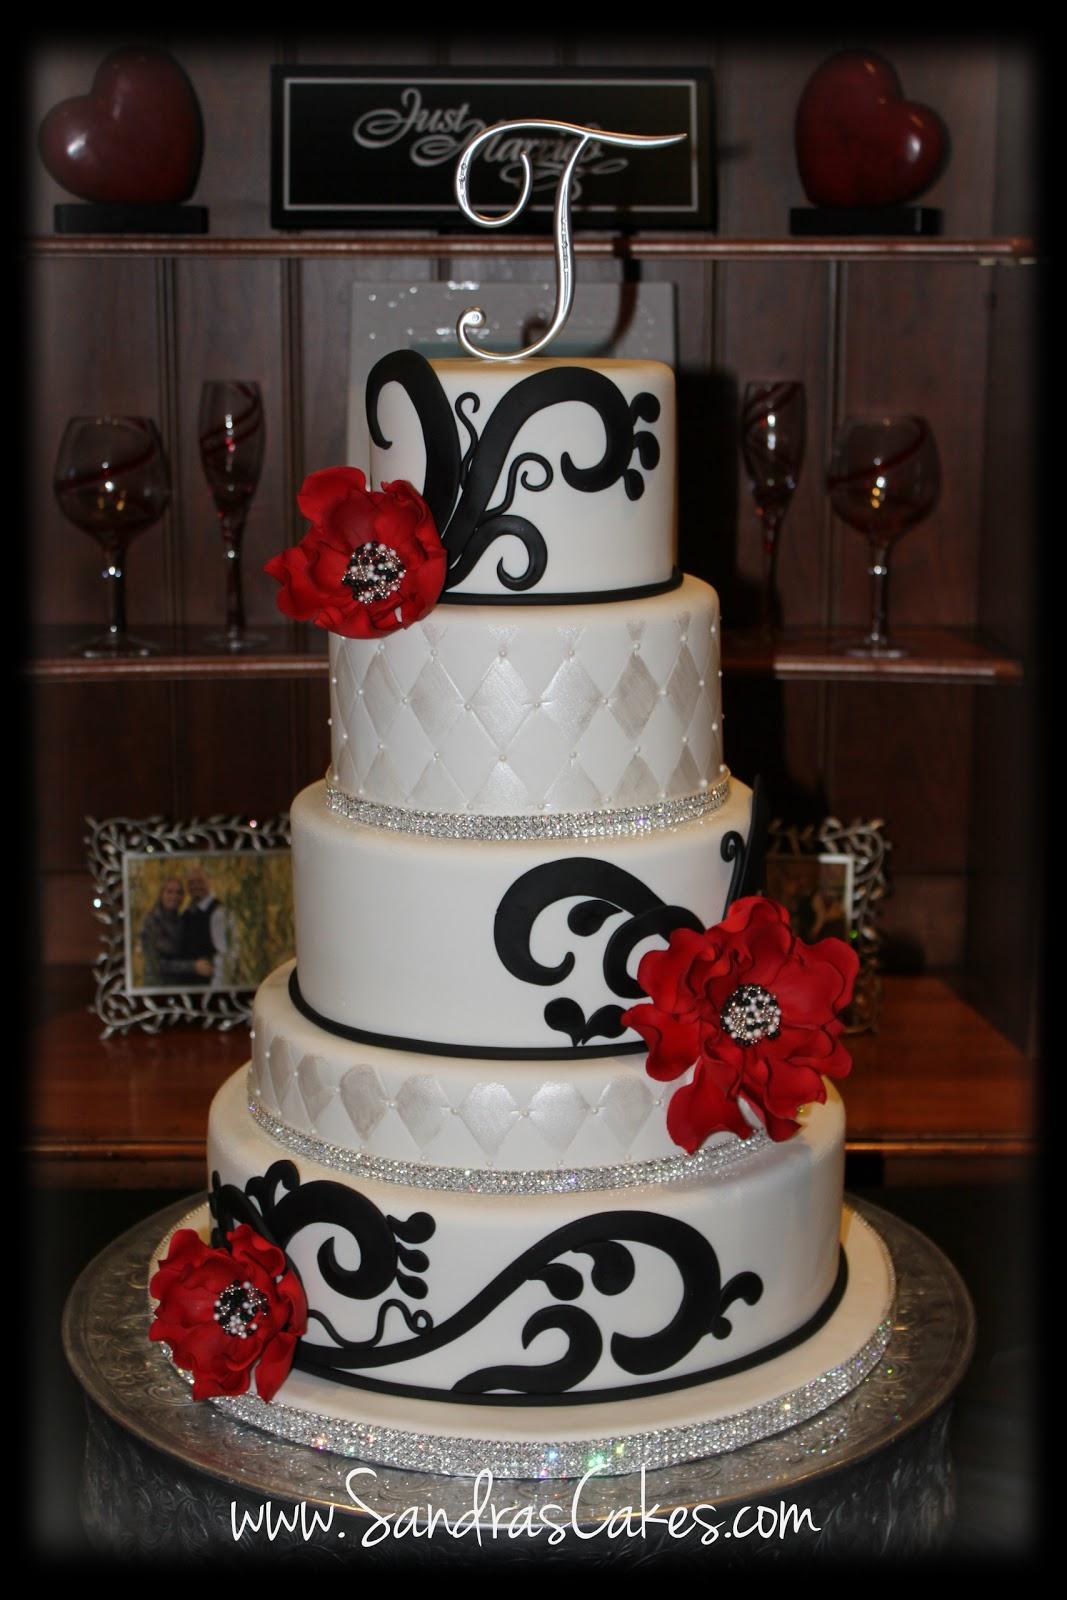 On Birthday Cakes Red Black And White Wedding Cake